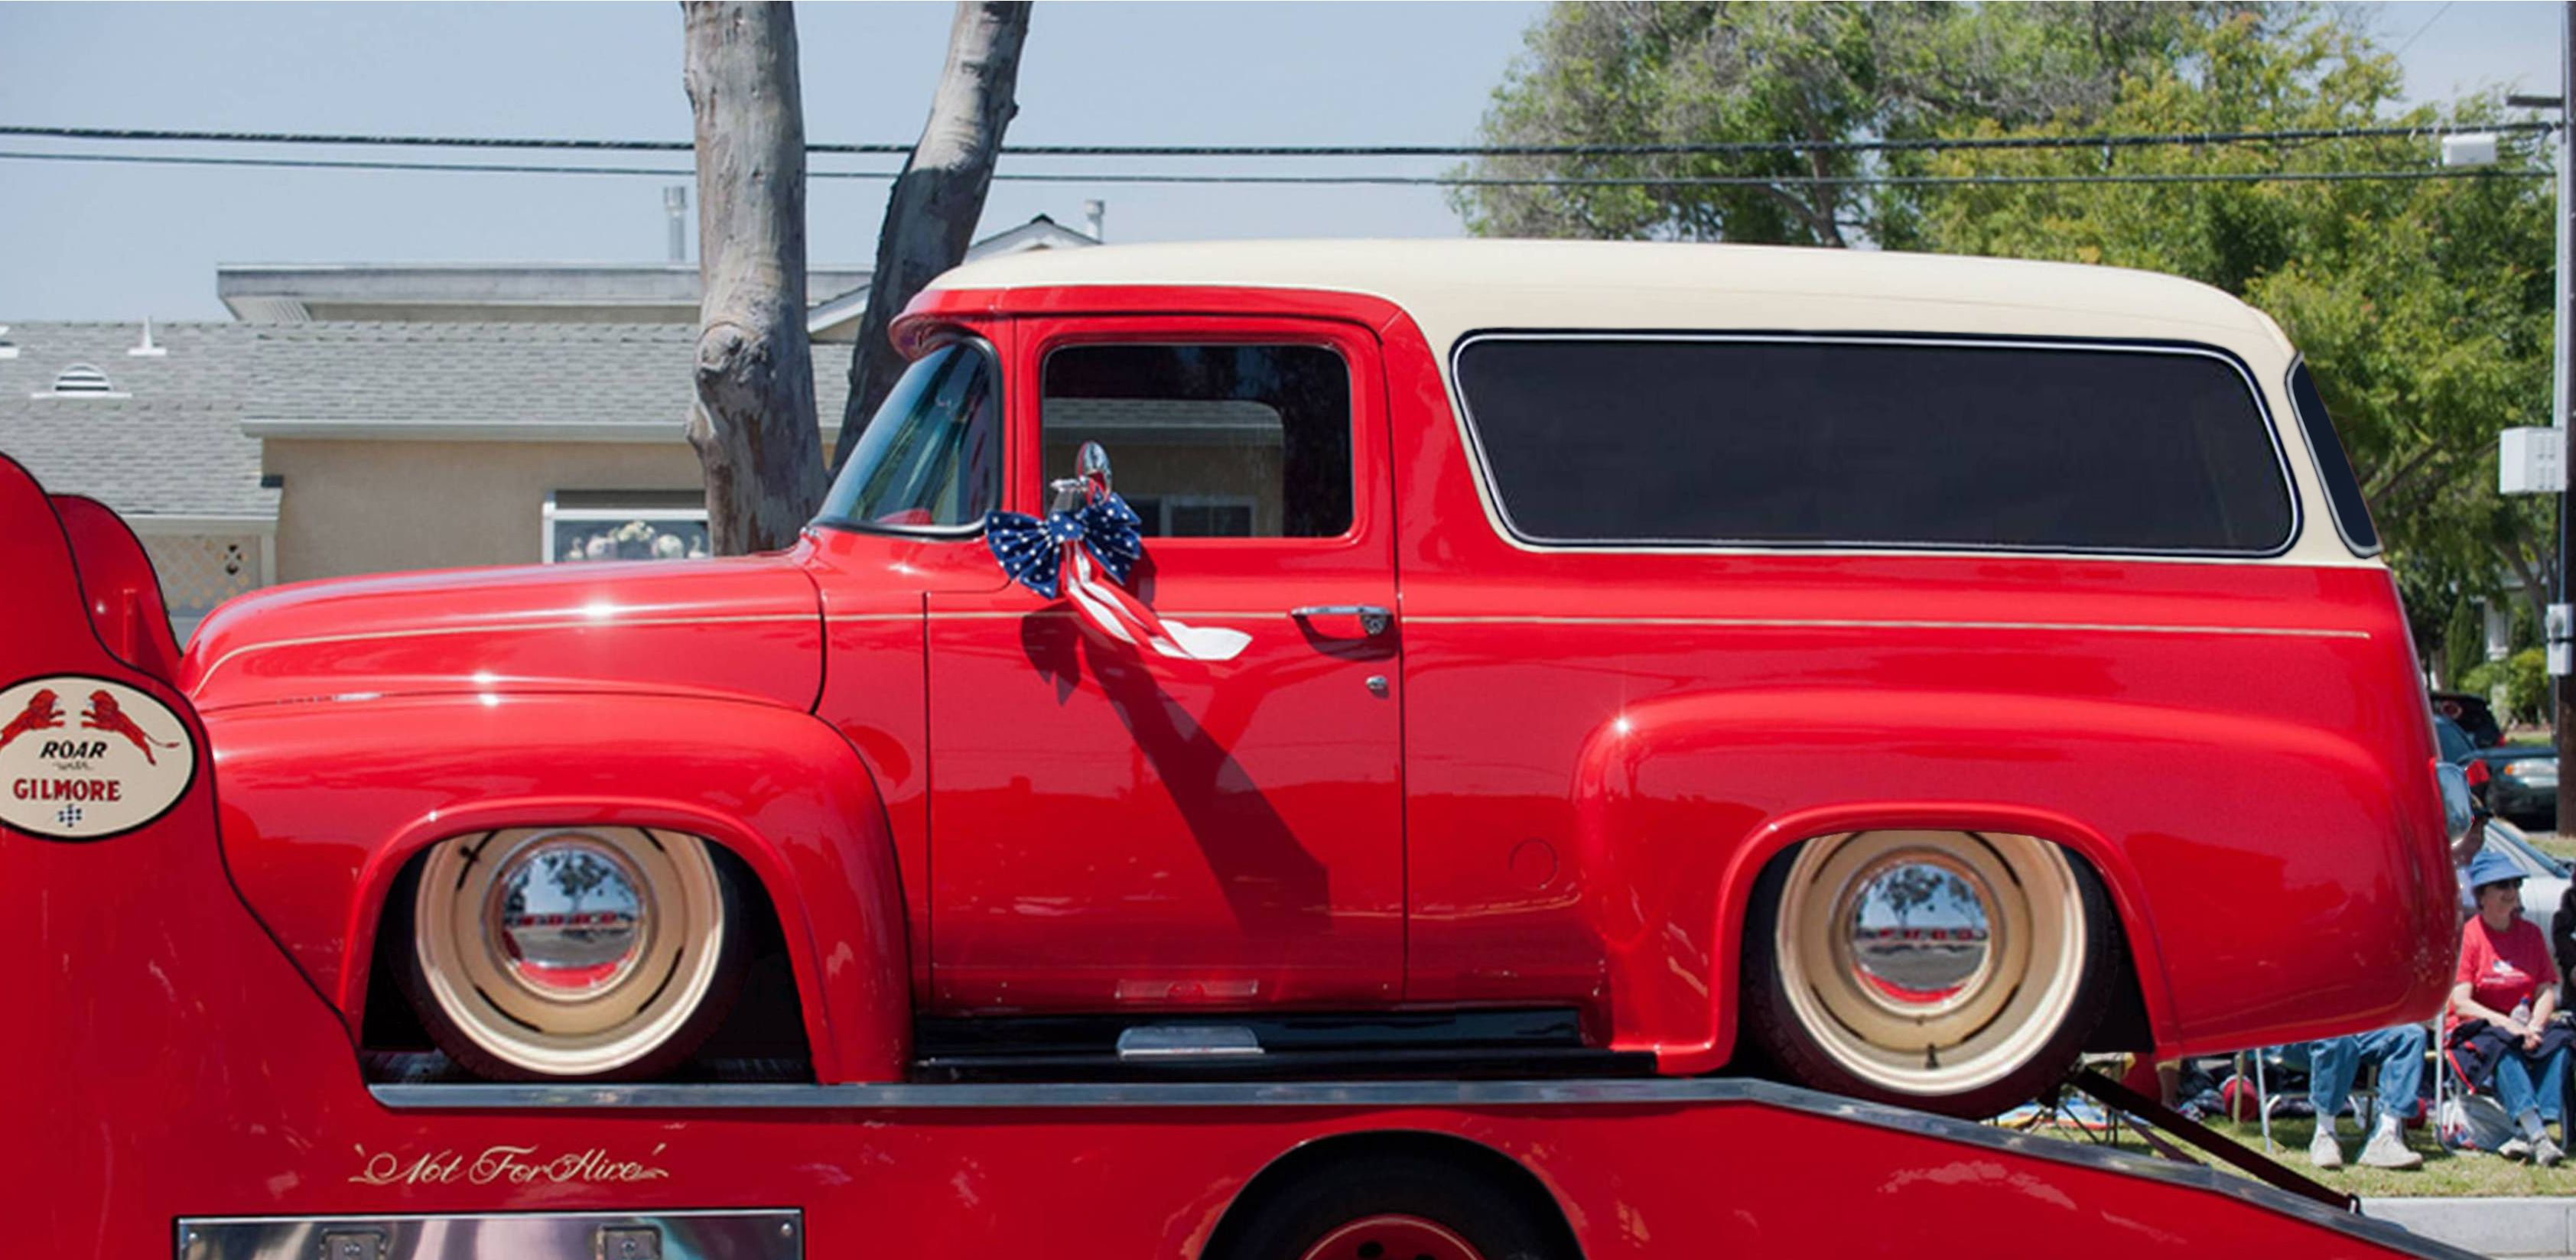 1956 F100 Bronco Panel Truck Classic Cars Trucks Hot Rods 1956 Ford Truck